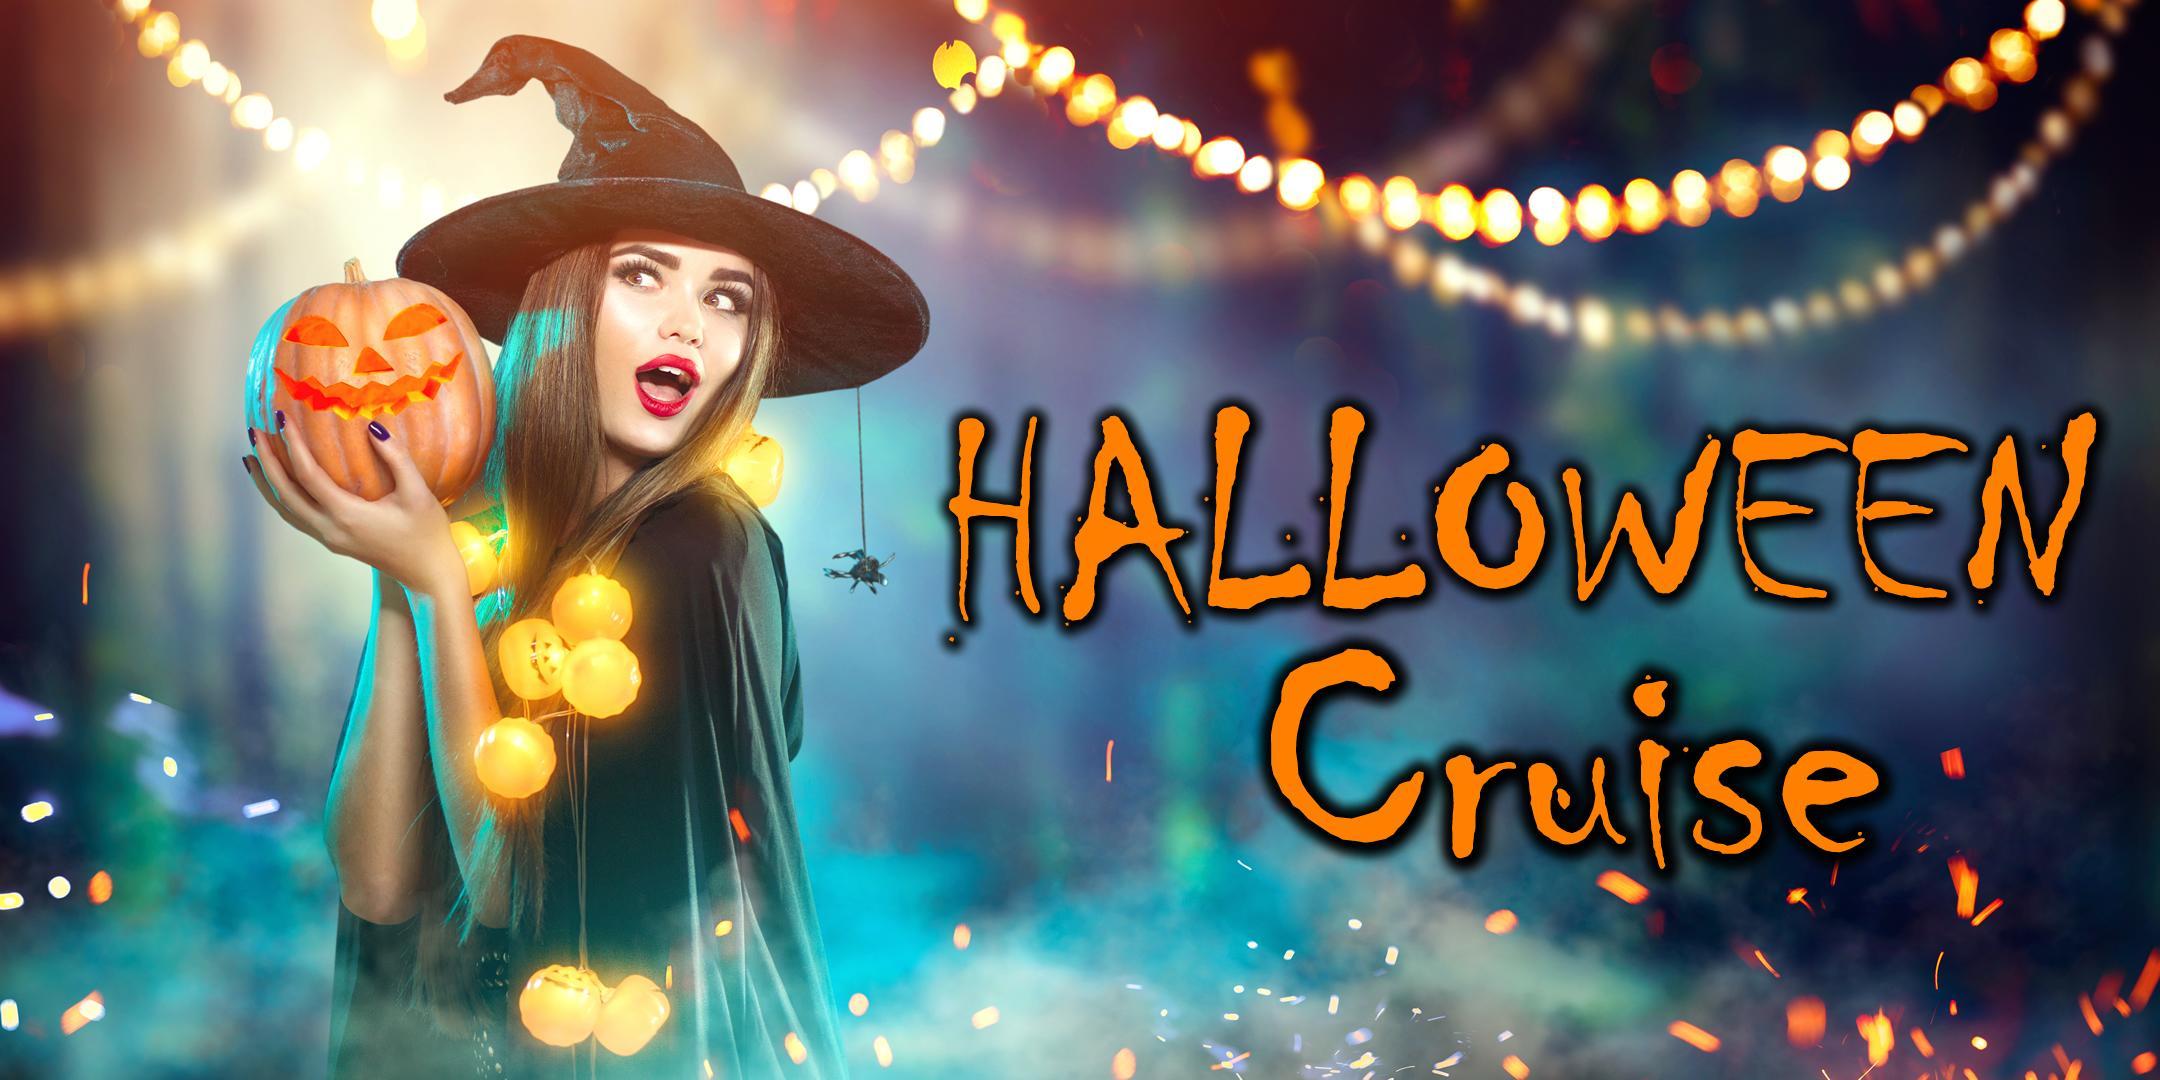 Halloween Booze Cruise Nyc 2020 HALLOWEEN BOOZE CRUISE NYC   The Jewel   31 OCT 2020